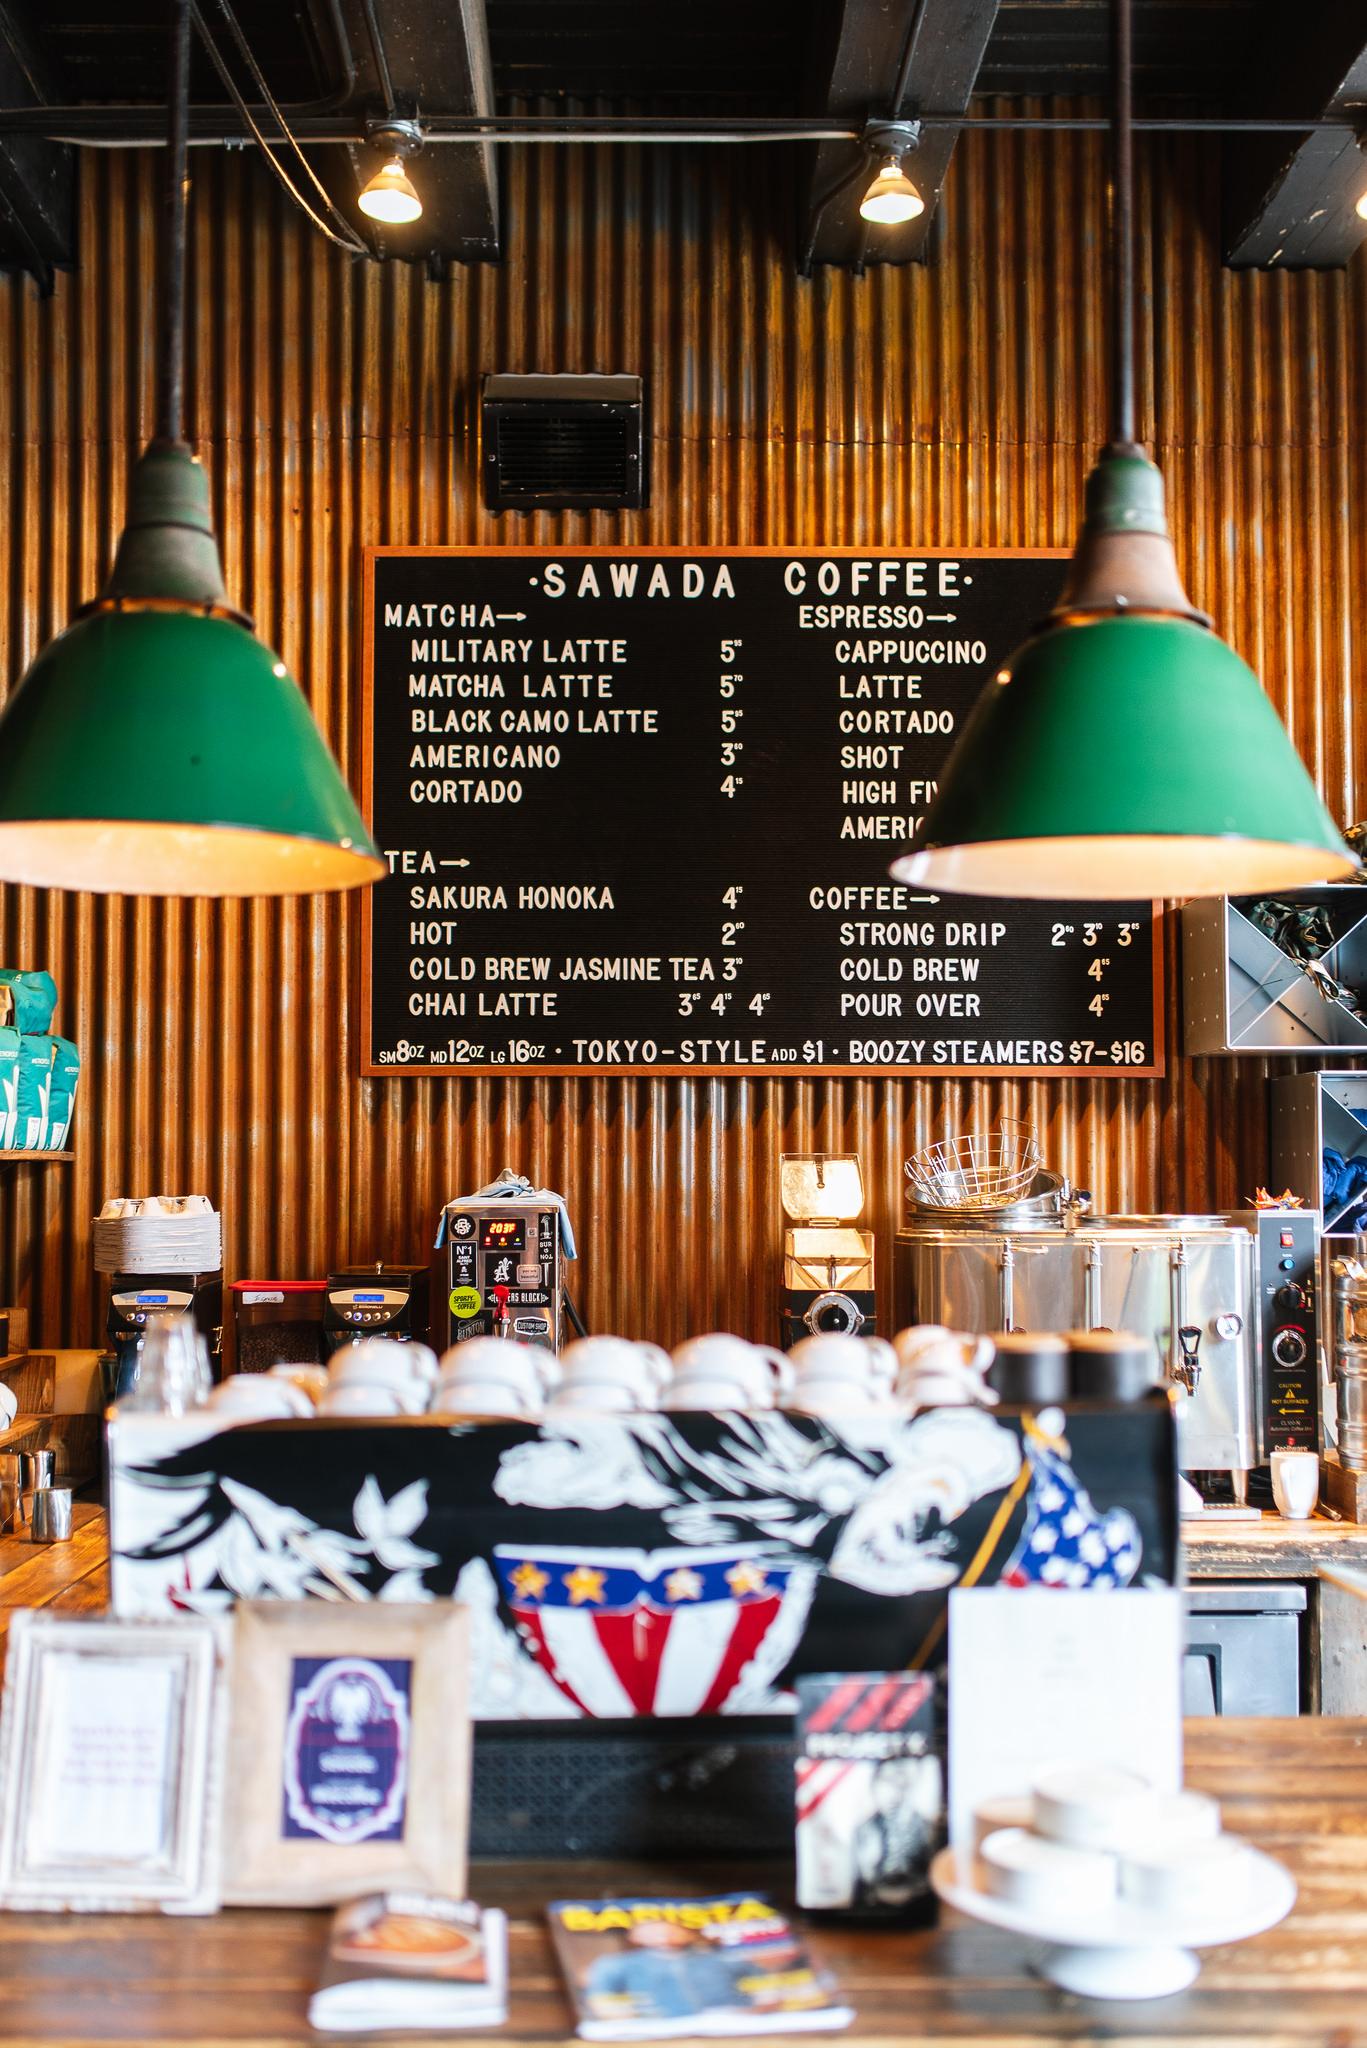 Sawada Coffee.jpg